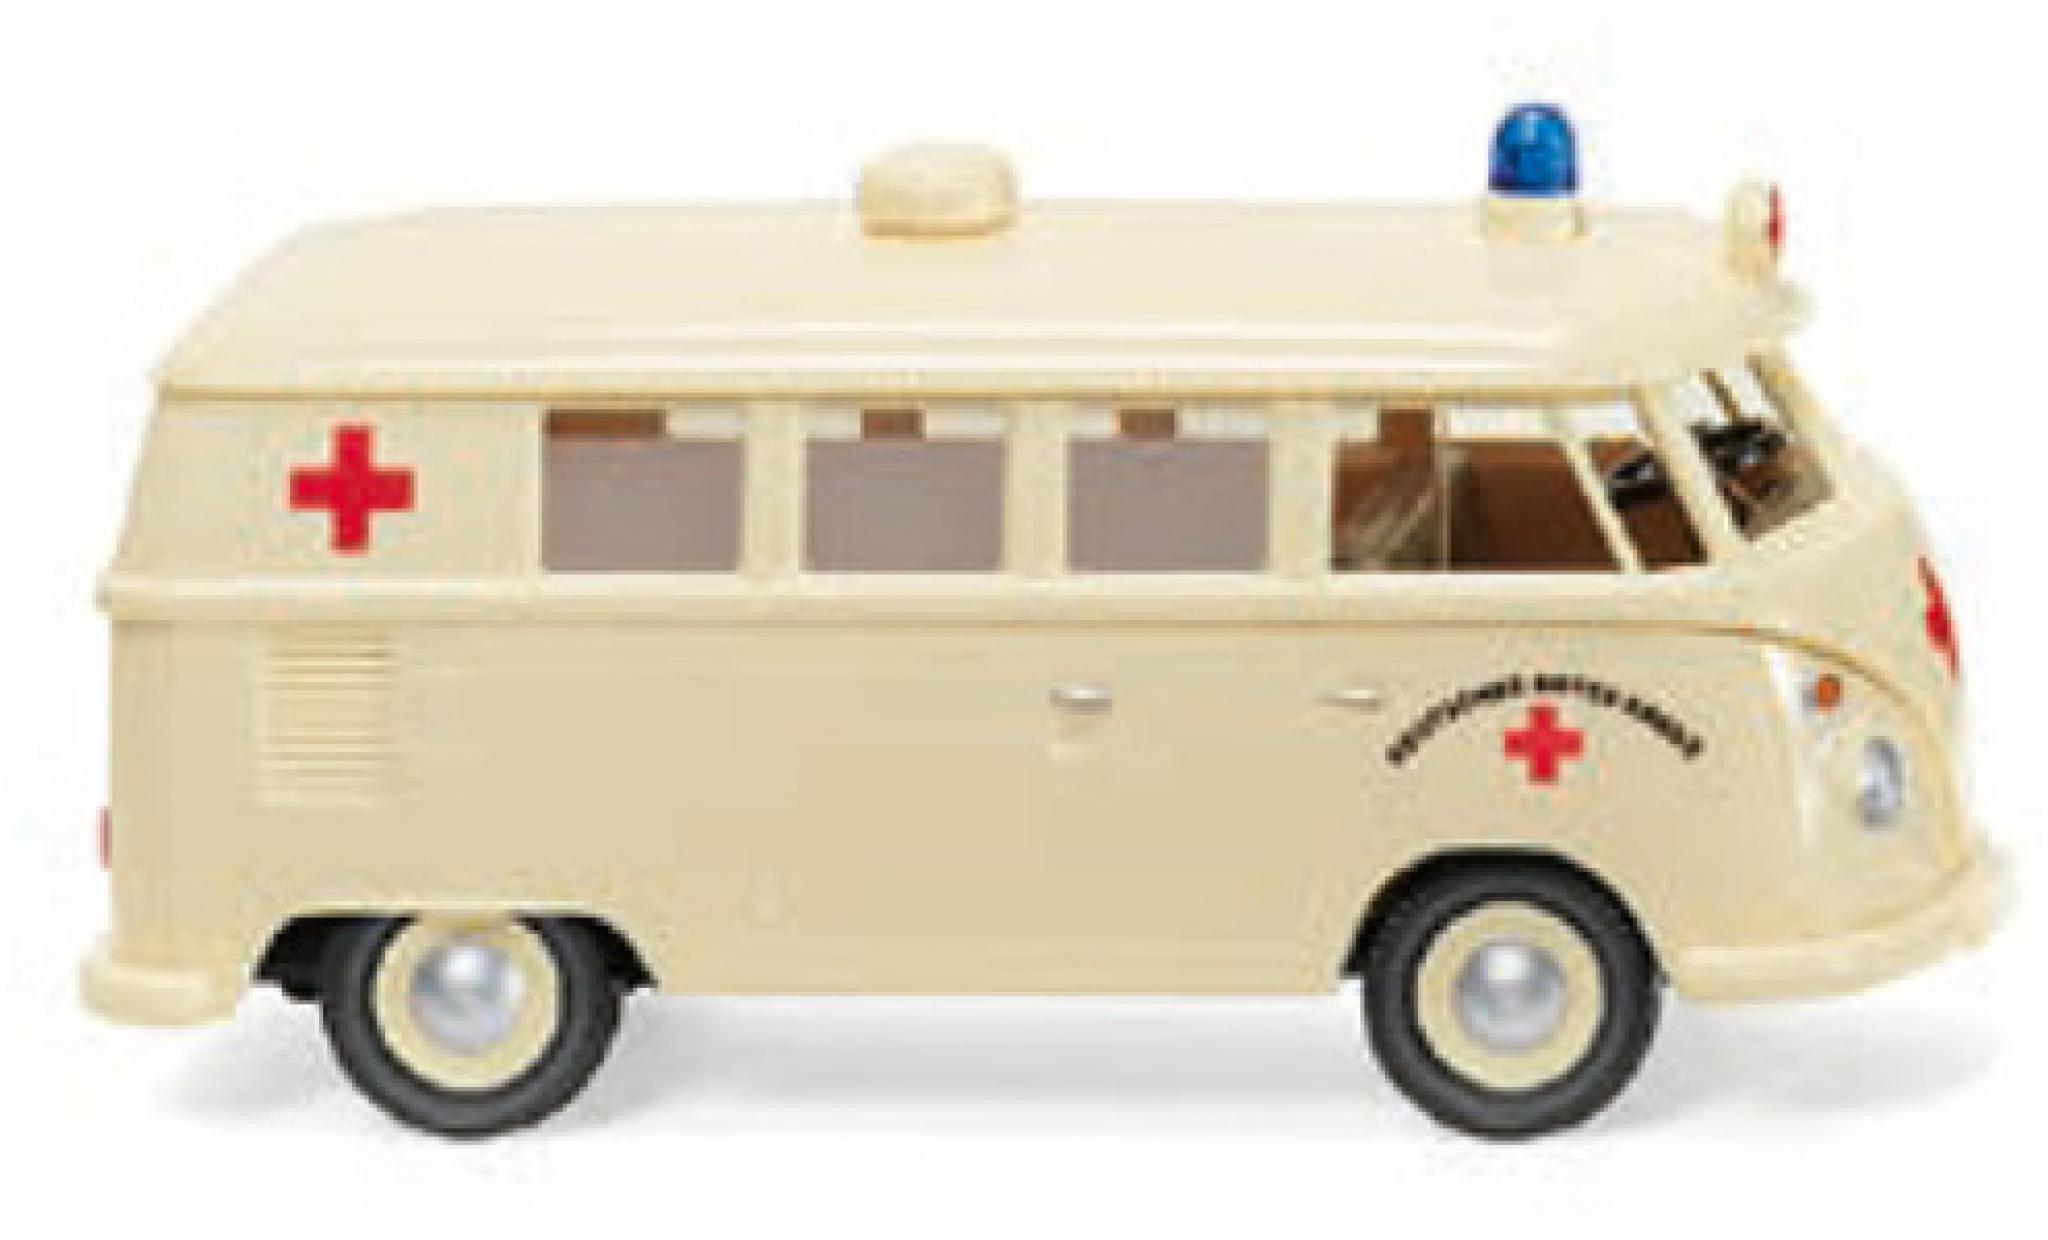 Volkswagen T1 1/87 Wiking Bus DRK - Deutsches Rotes Kreuz 1963